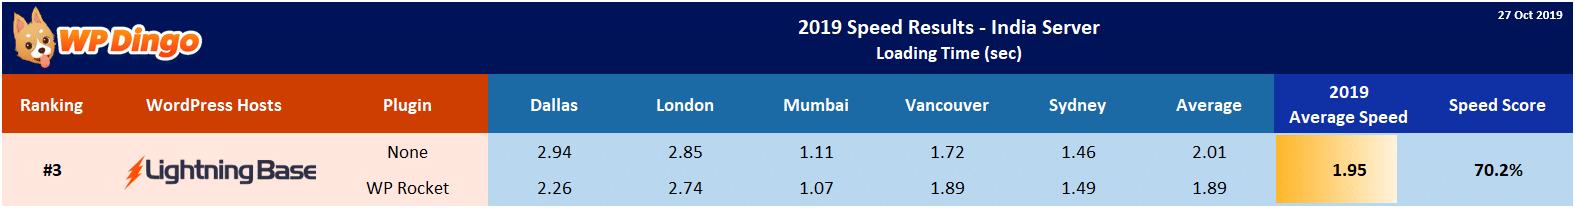 2019 Lightning Base Speed Table - India Server